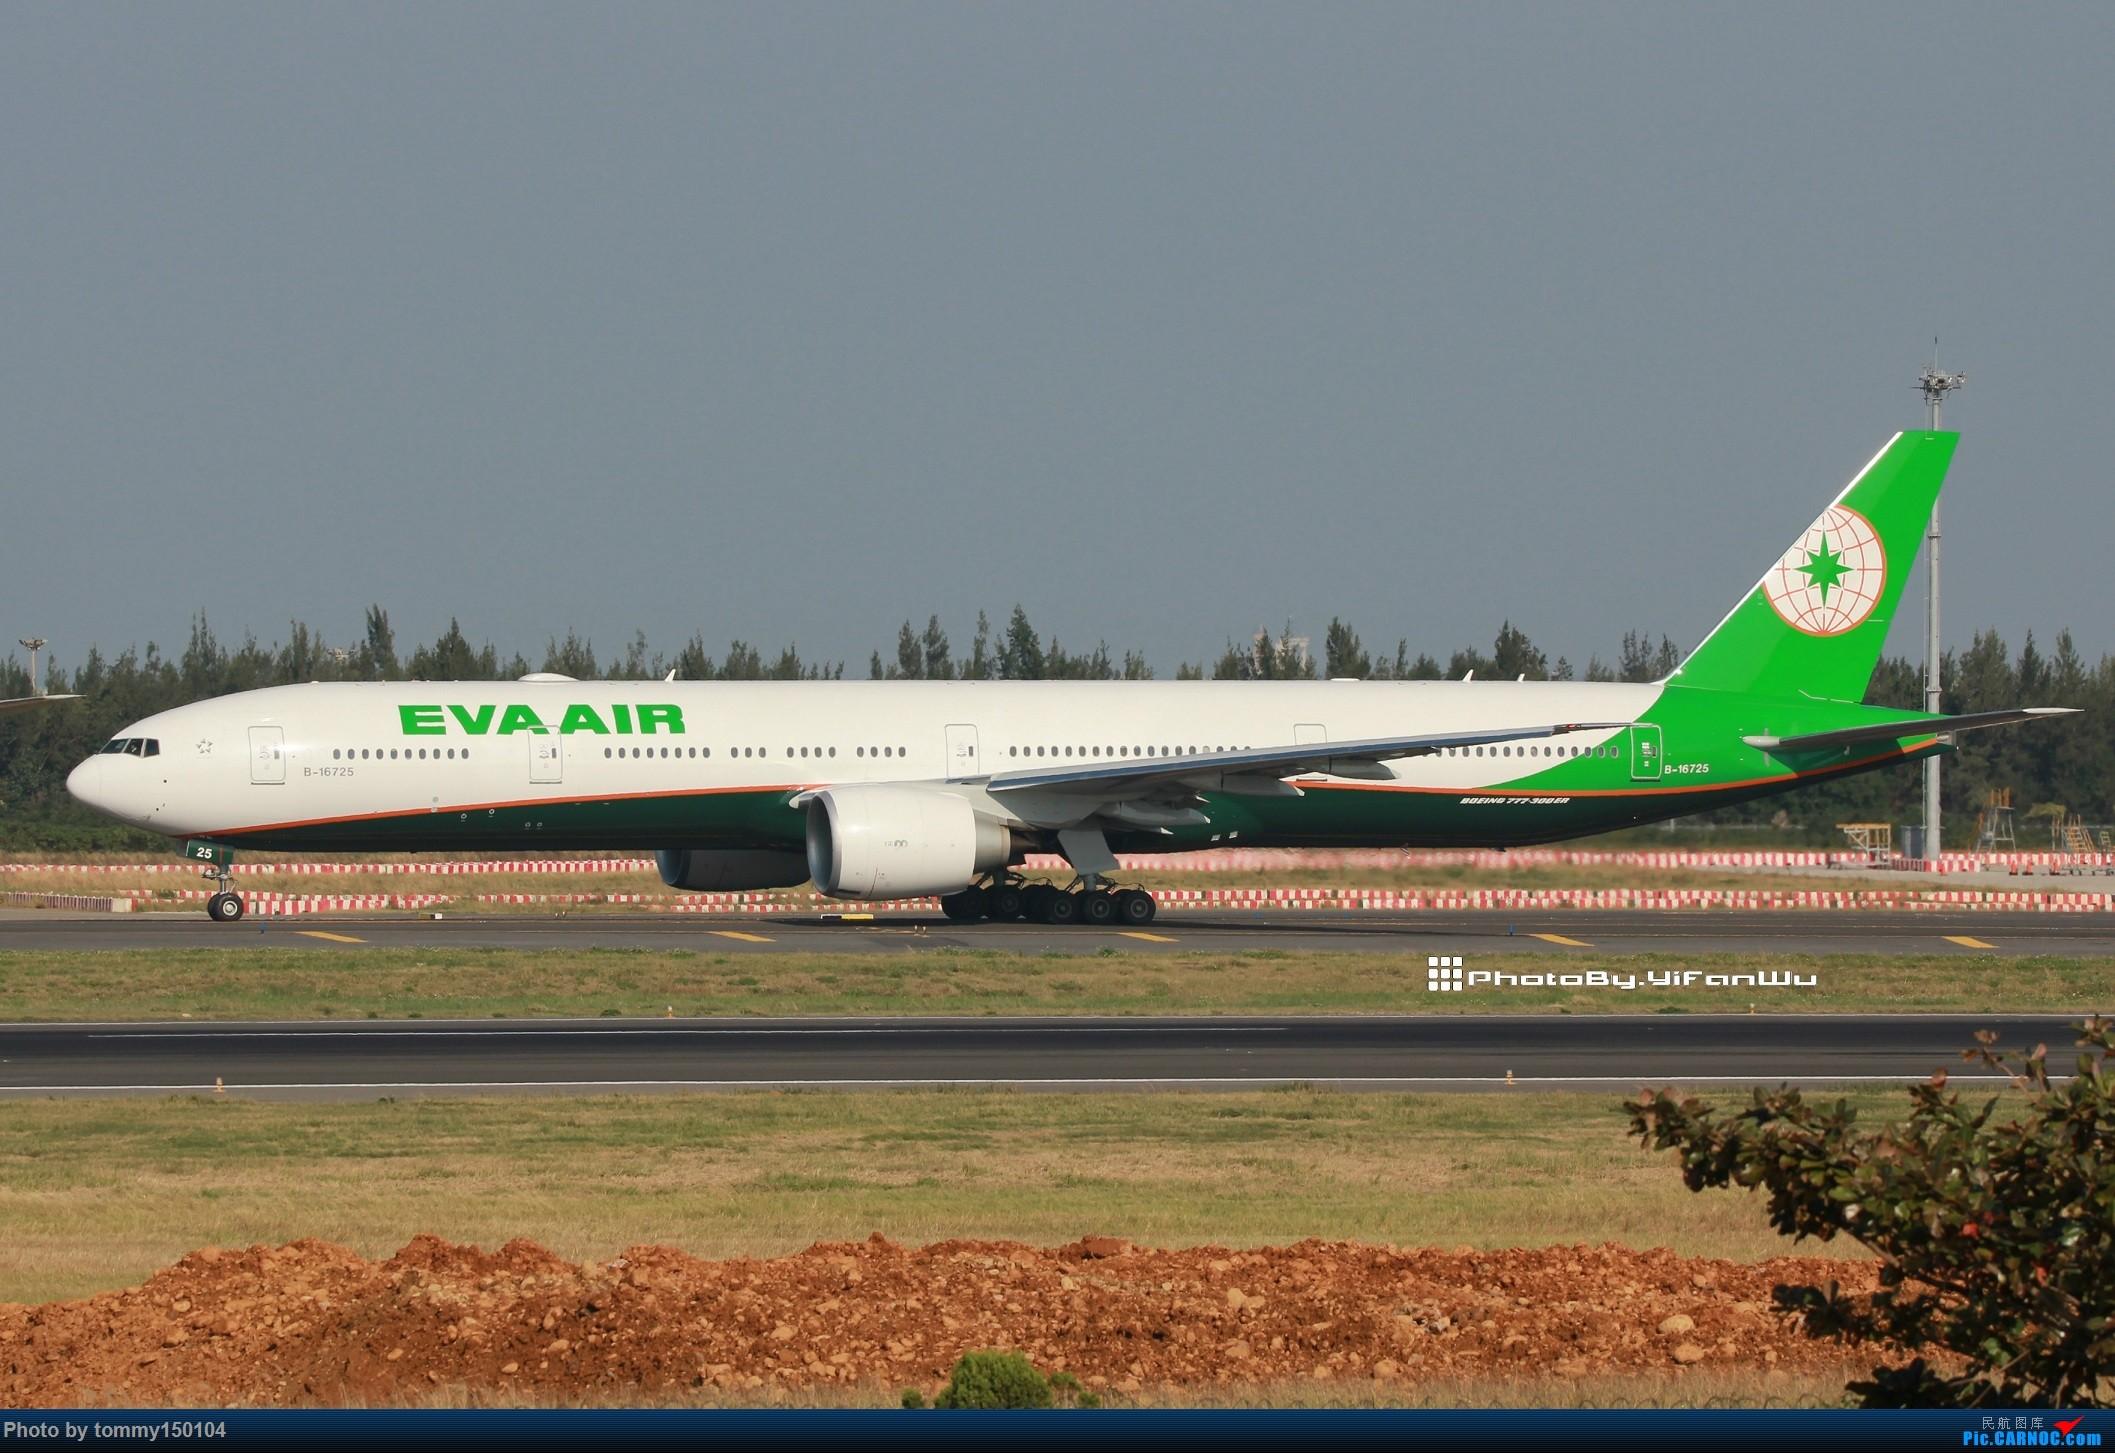 Re:[原创]新手試貼 TPE台北桃園 BOEING 777-300ER B-16725 中国台北桃园国际机场